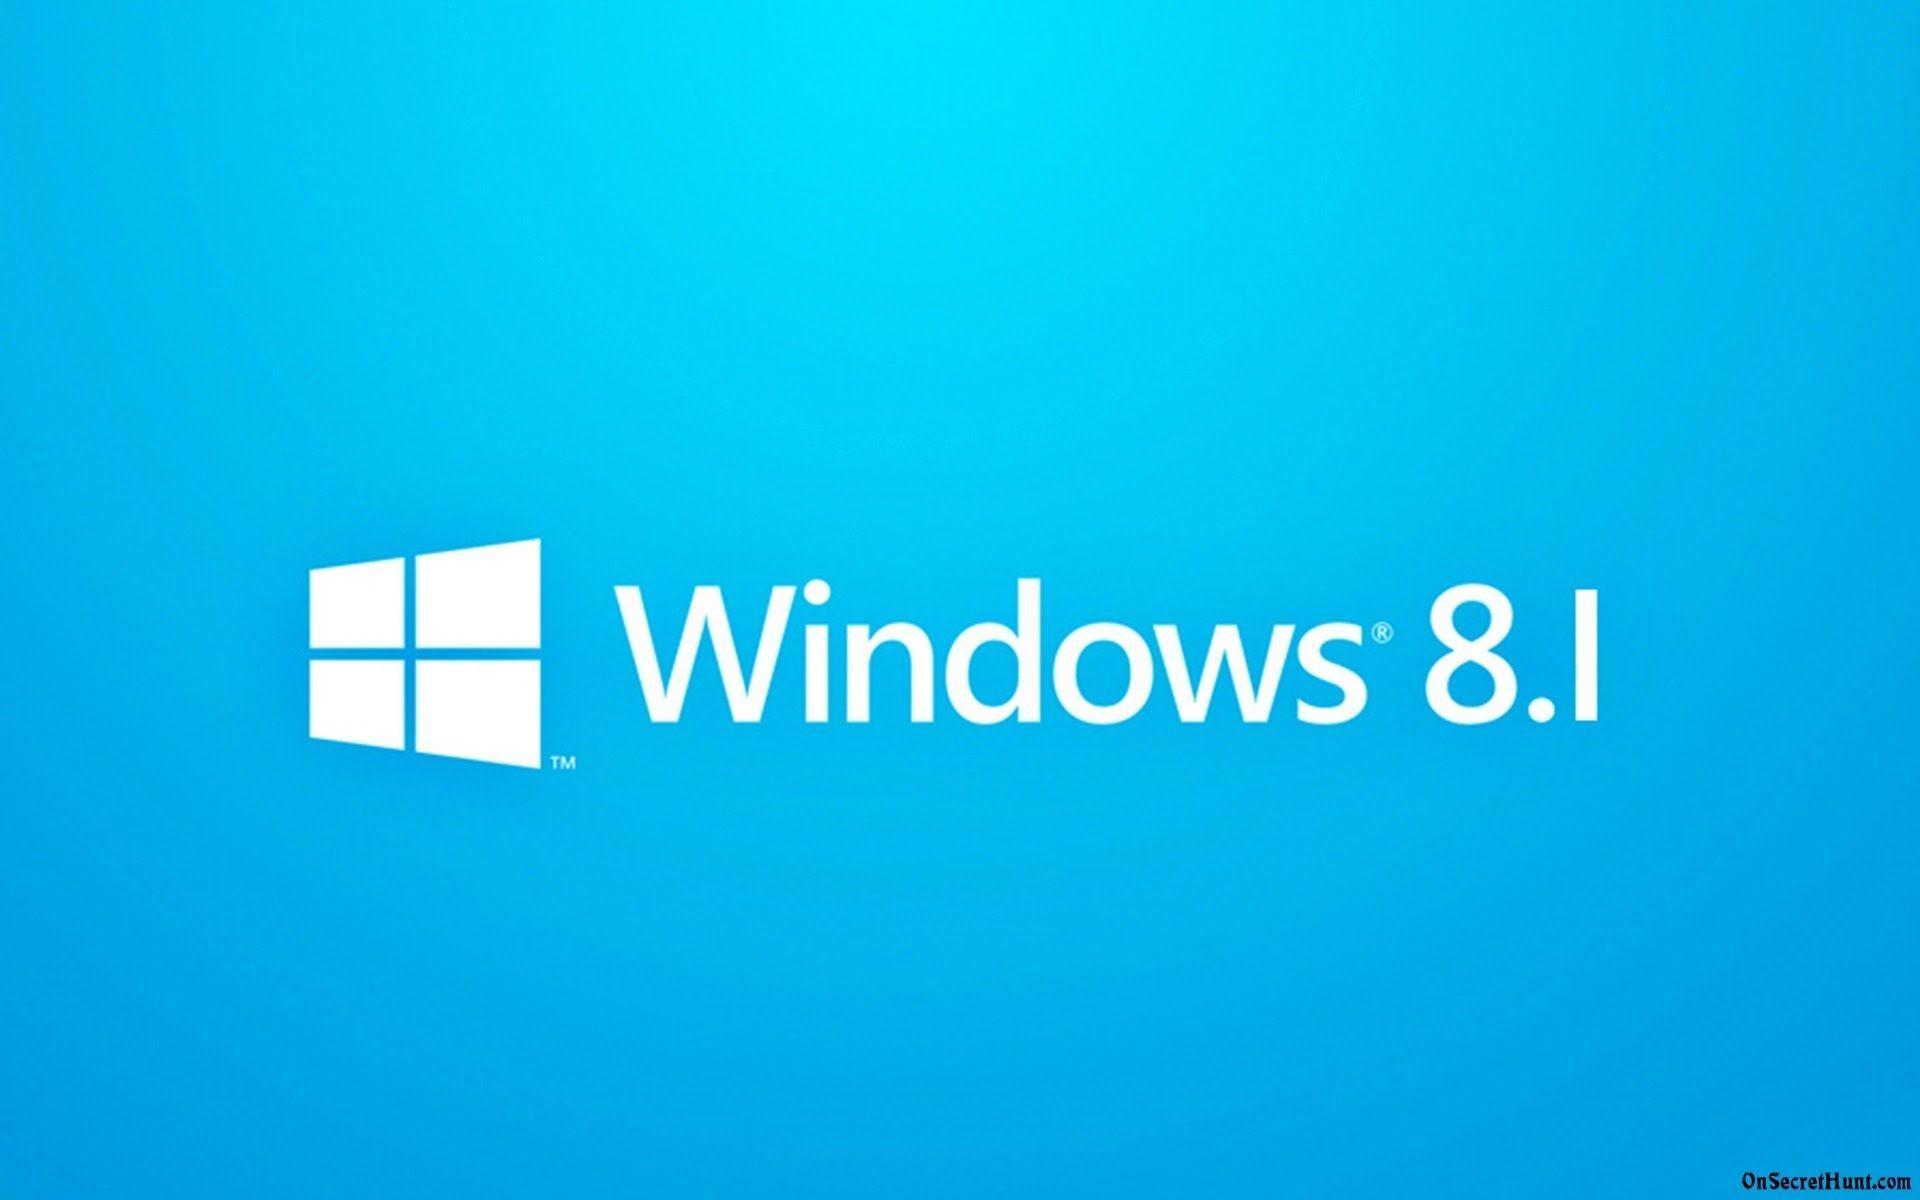 Windows 8 Logo Wallpapers Wallpaper Cave